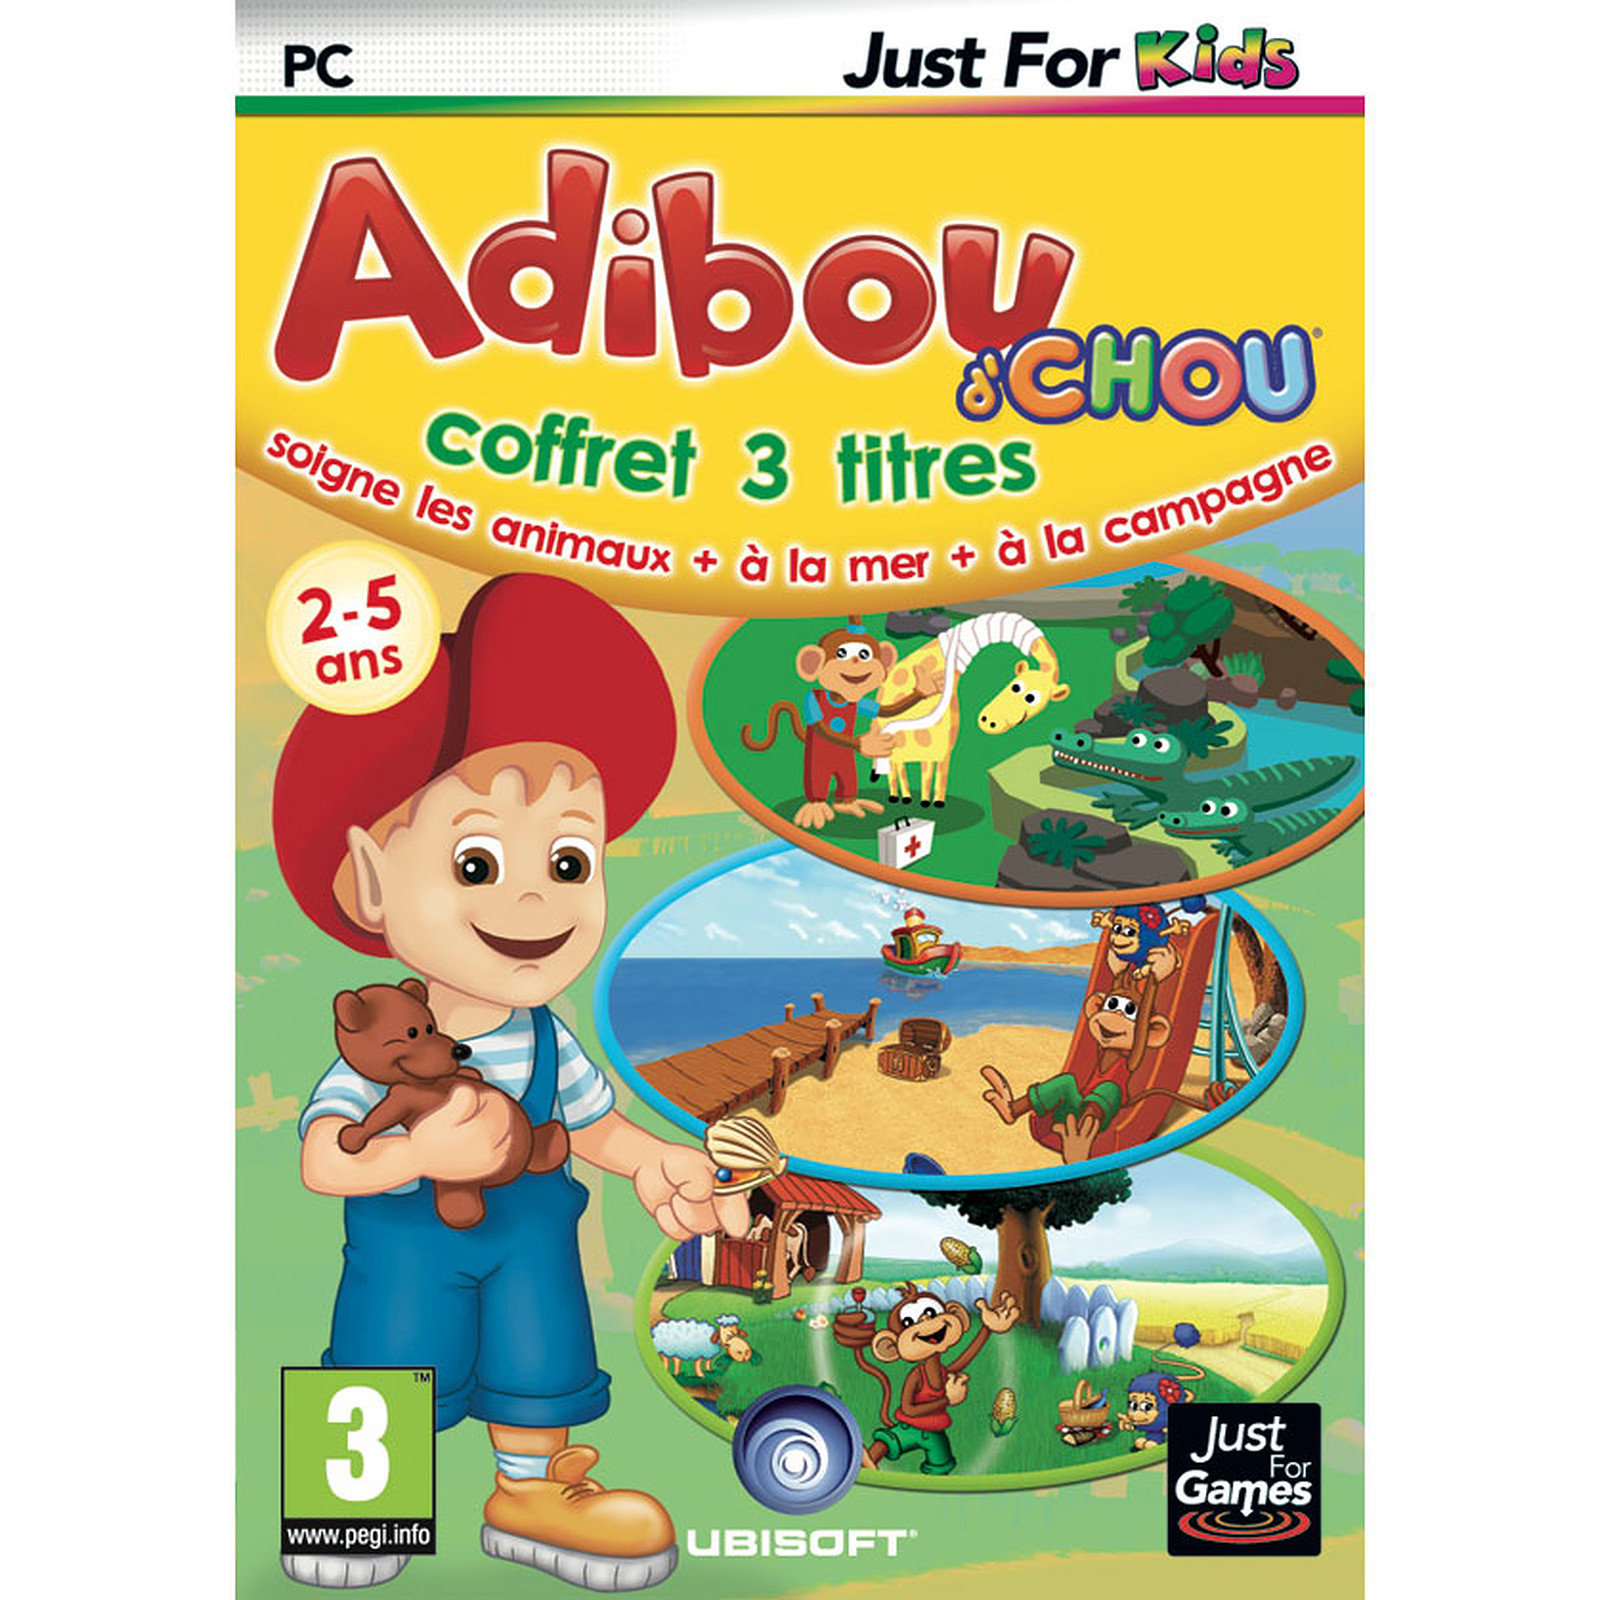 Pack Adibou'chou Mer + Campagne + Soigne Les Animaux (Pc avec Jeu Pc Adibou